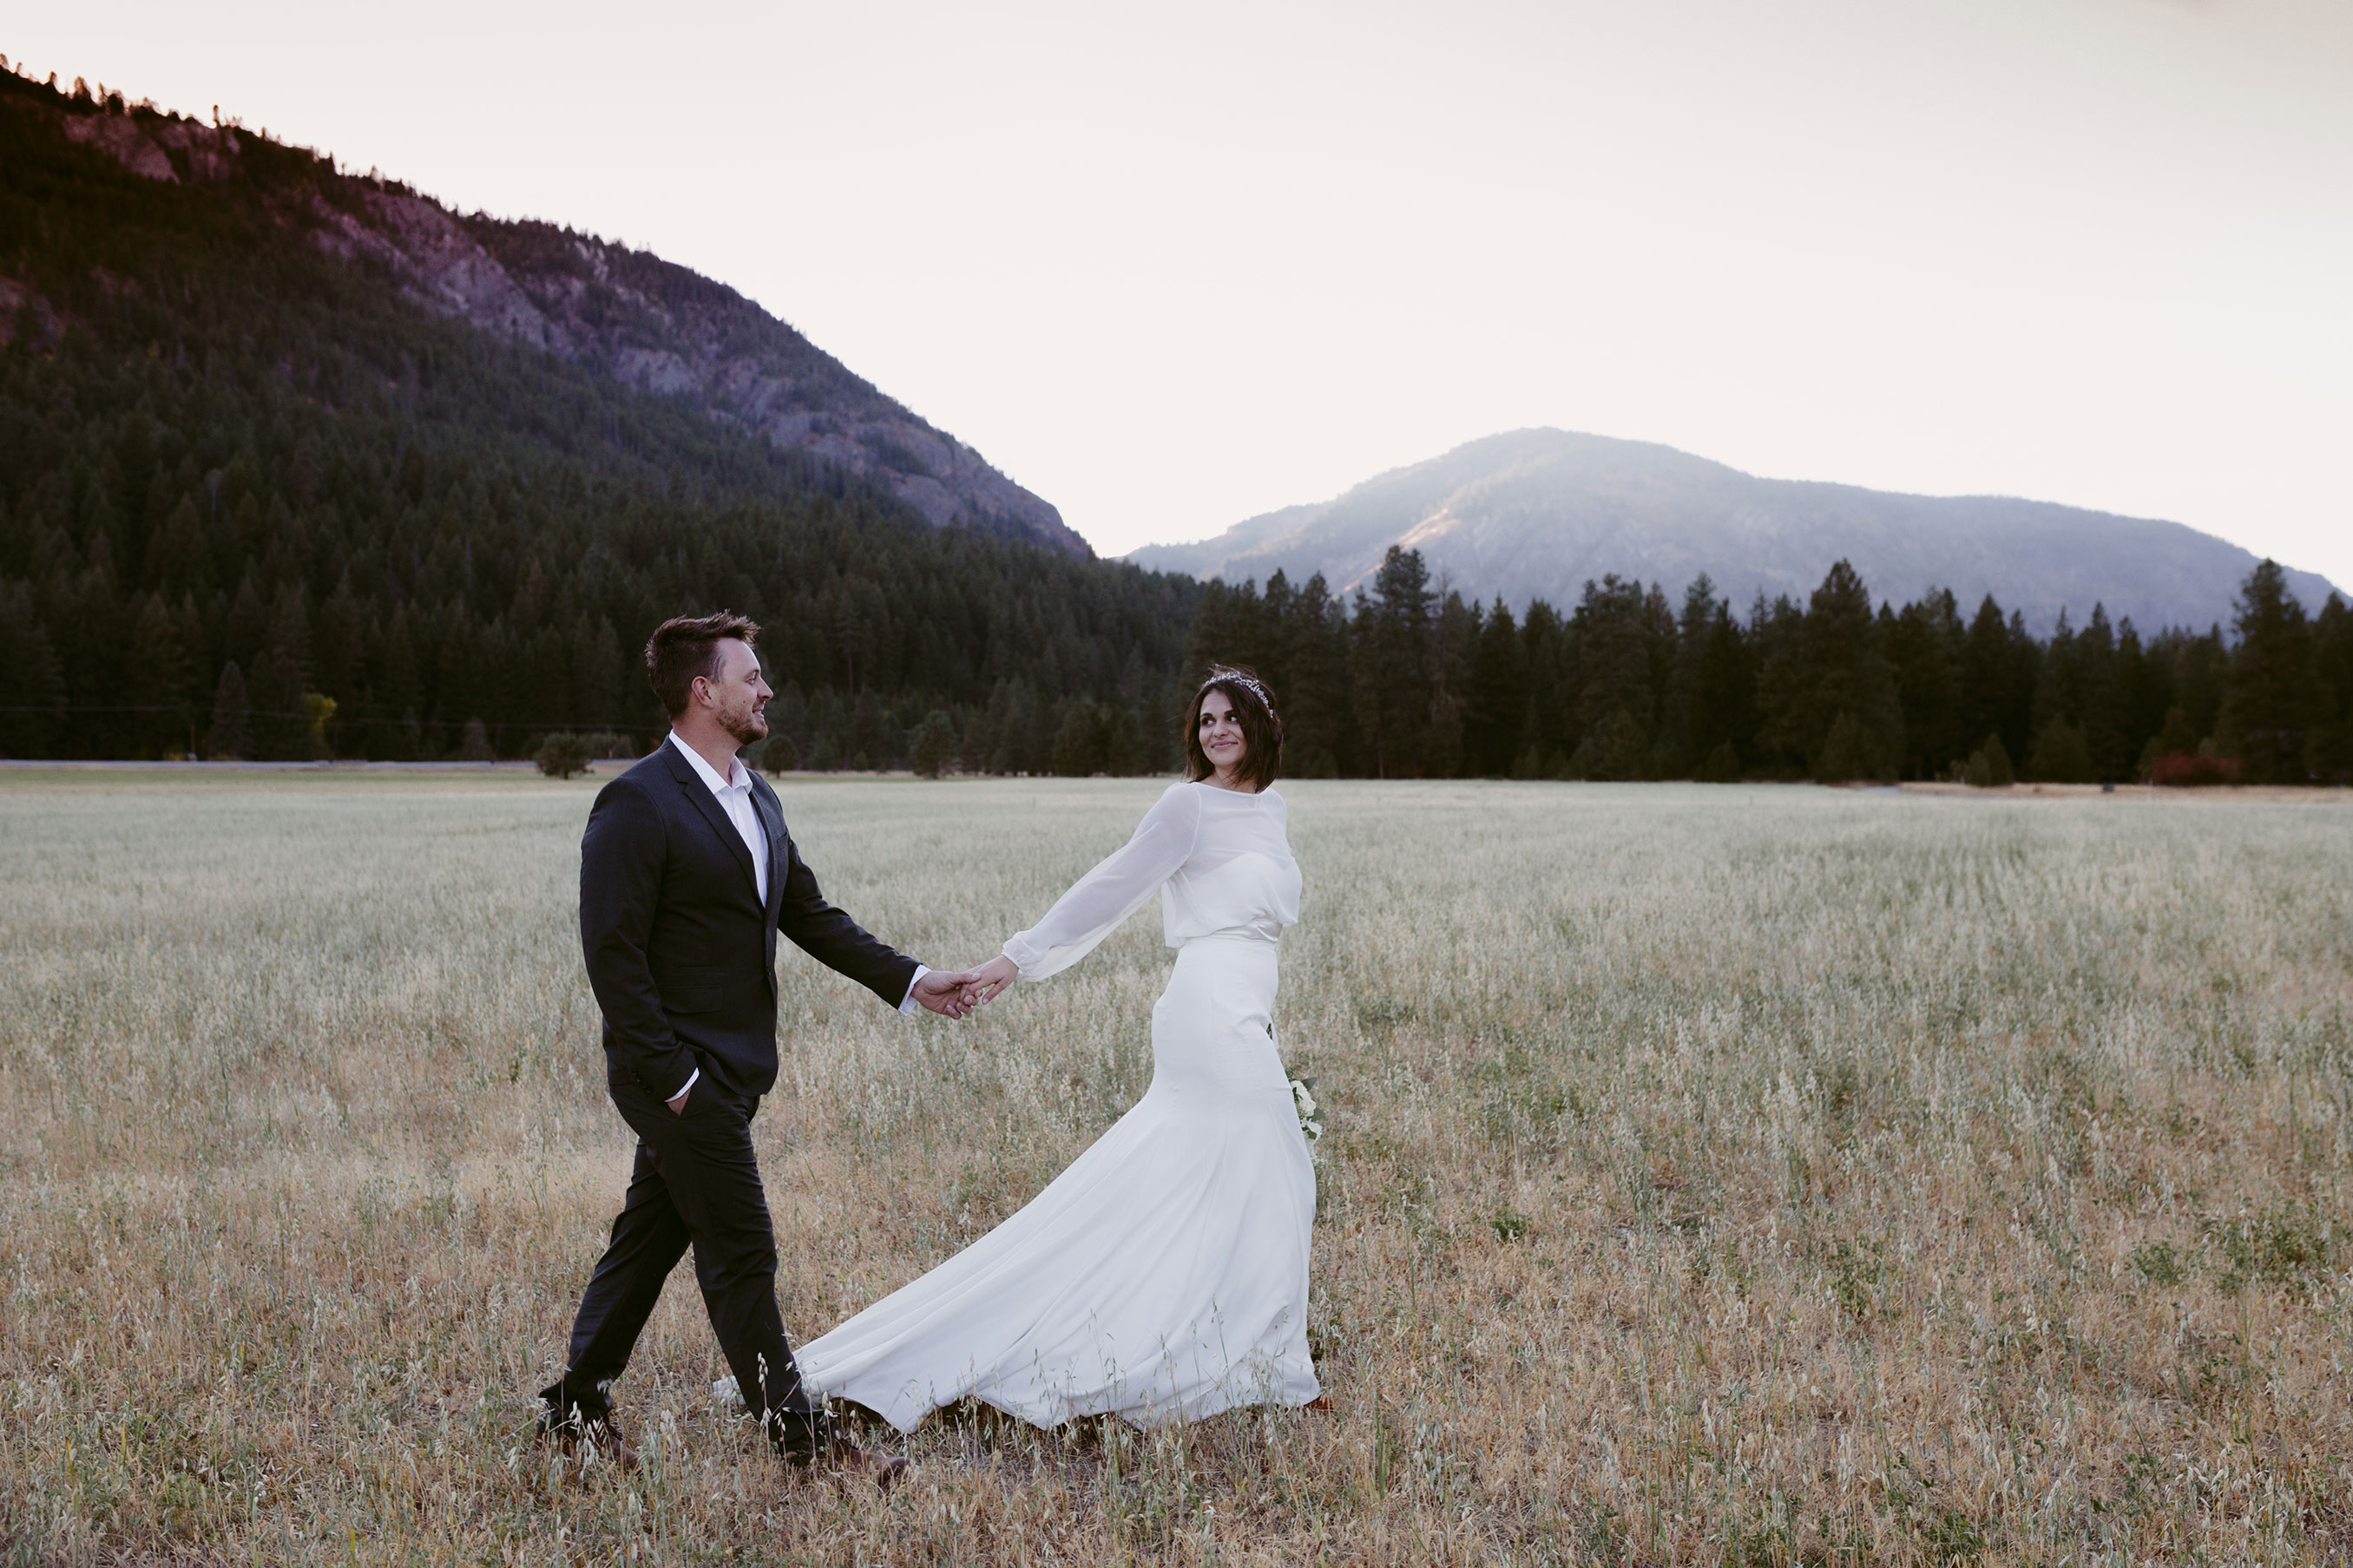 Bride and groom walking through field elopement winthrop wa